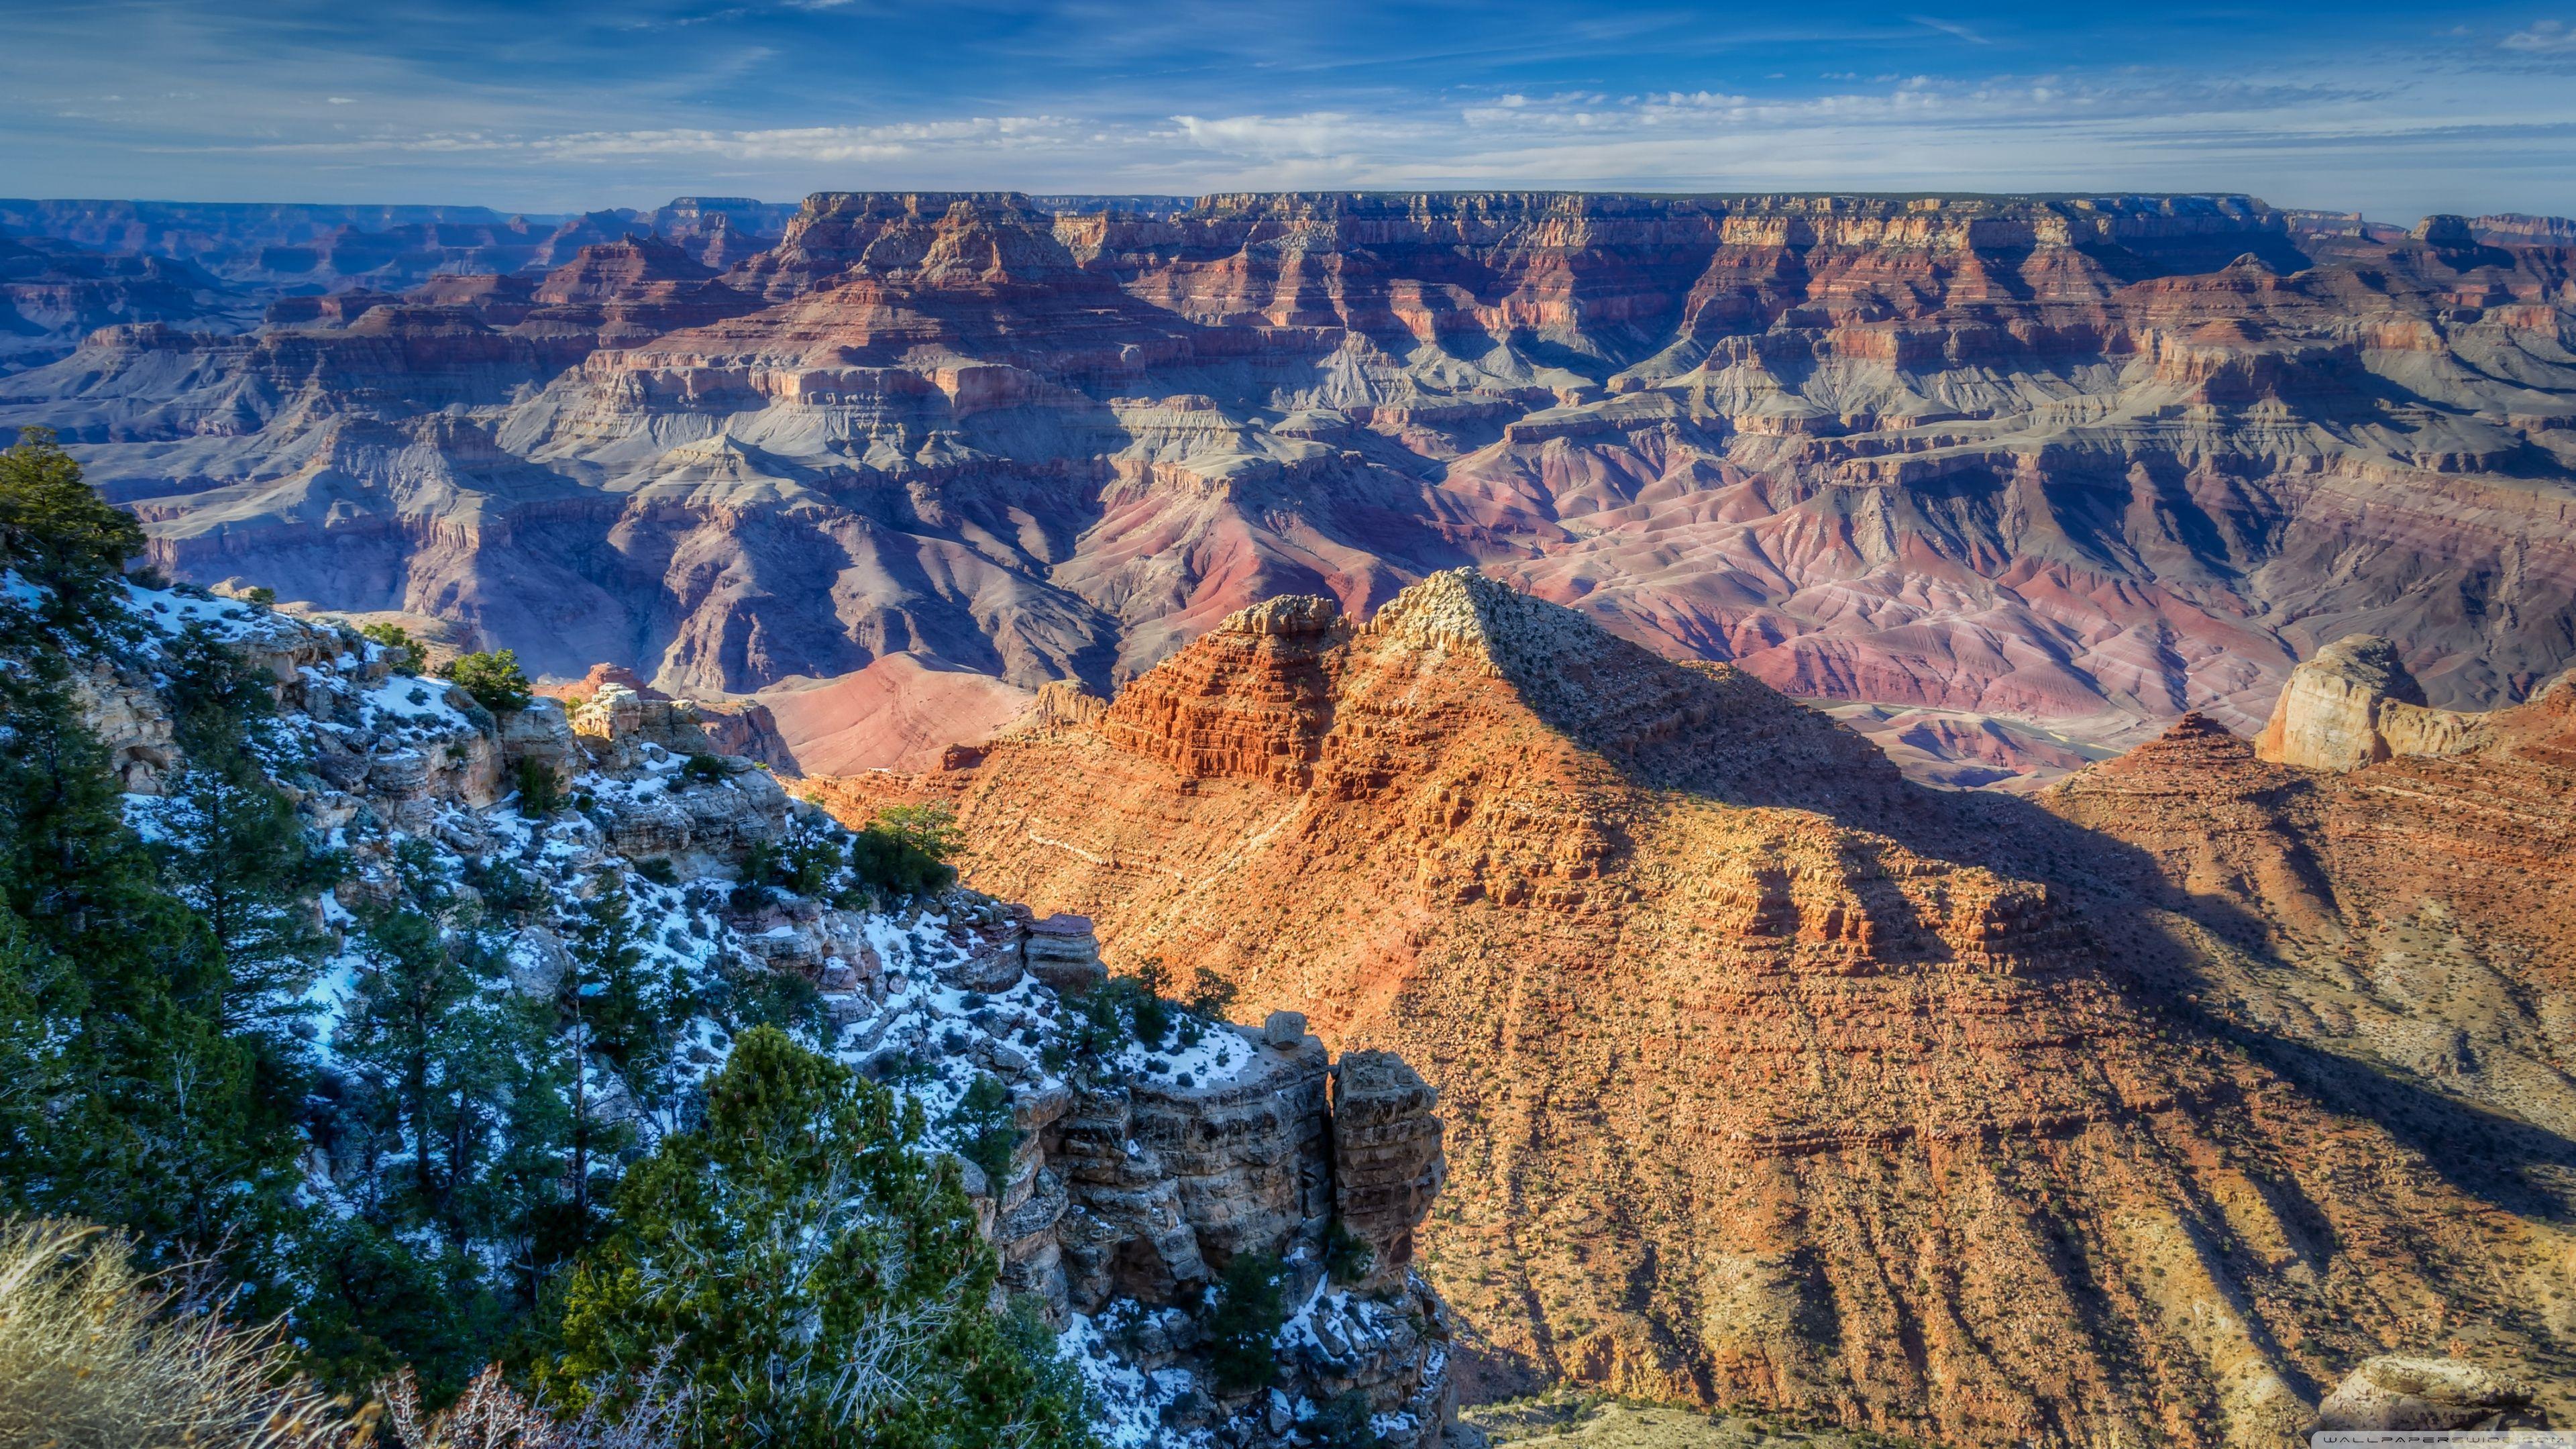 Grand Canyon Uhd 8k Wallpapers Top Free Grand Canyon Uhd